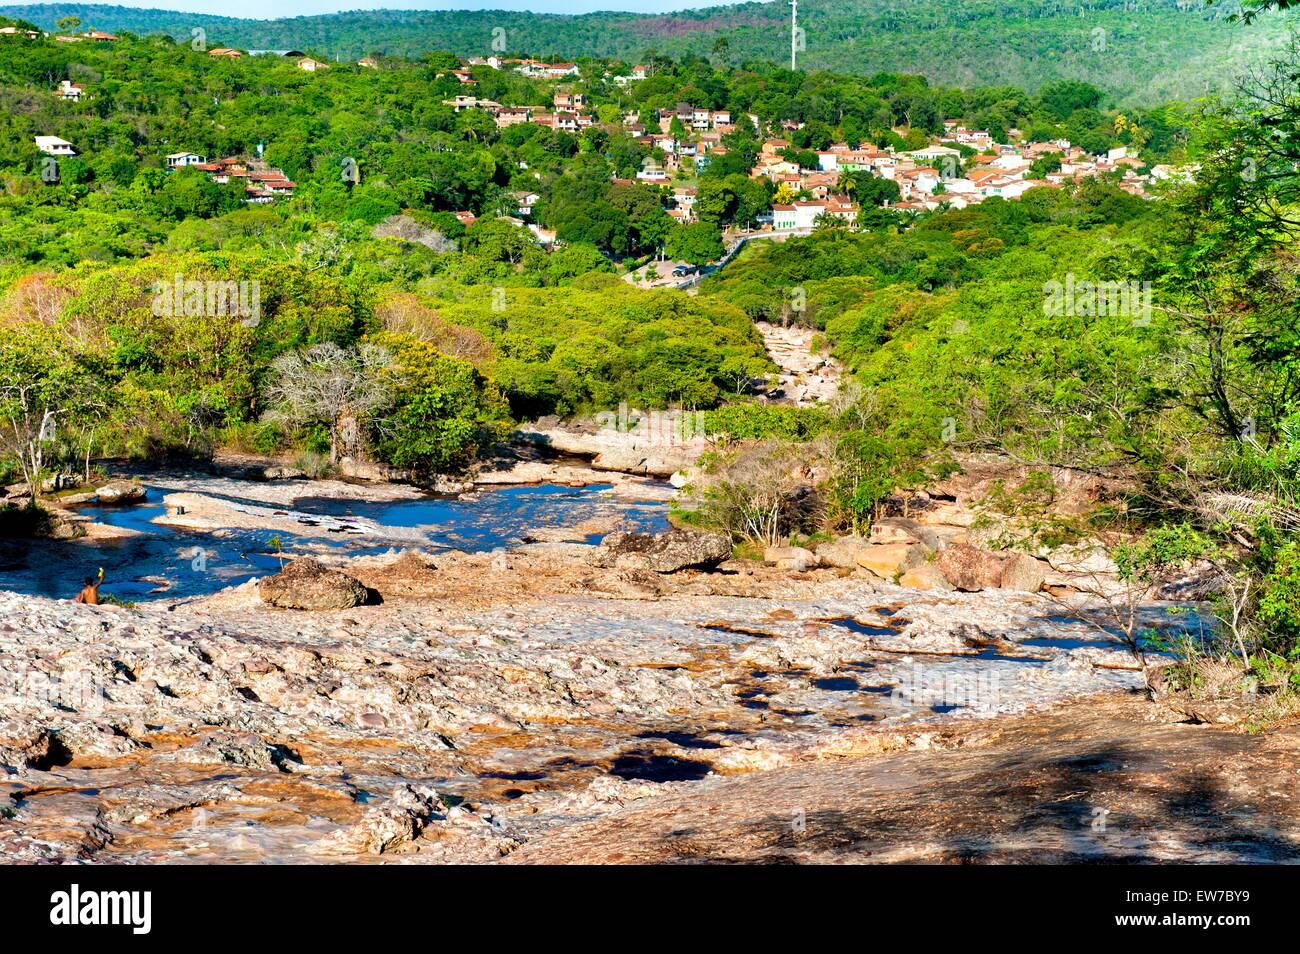 Lencois City, Chapada Diamantina, Brazil - Stock Image